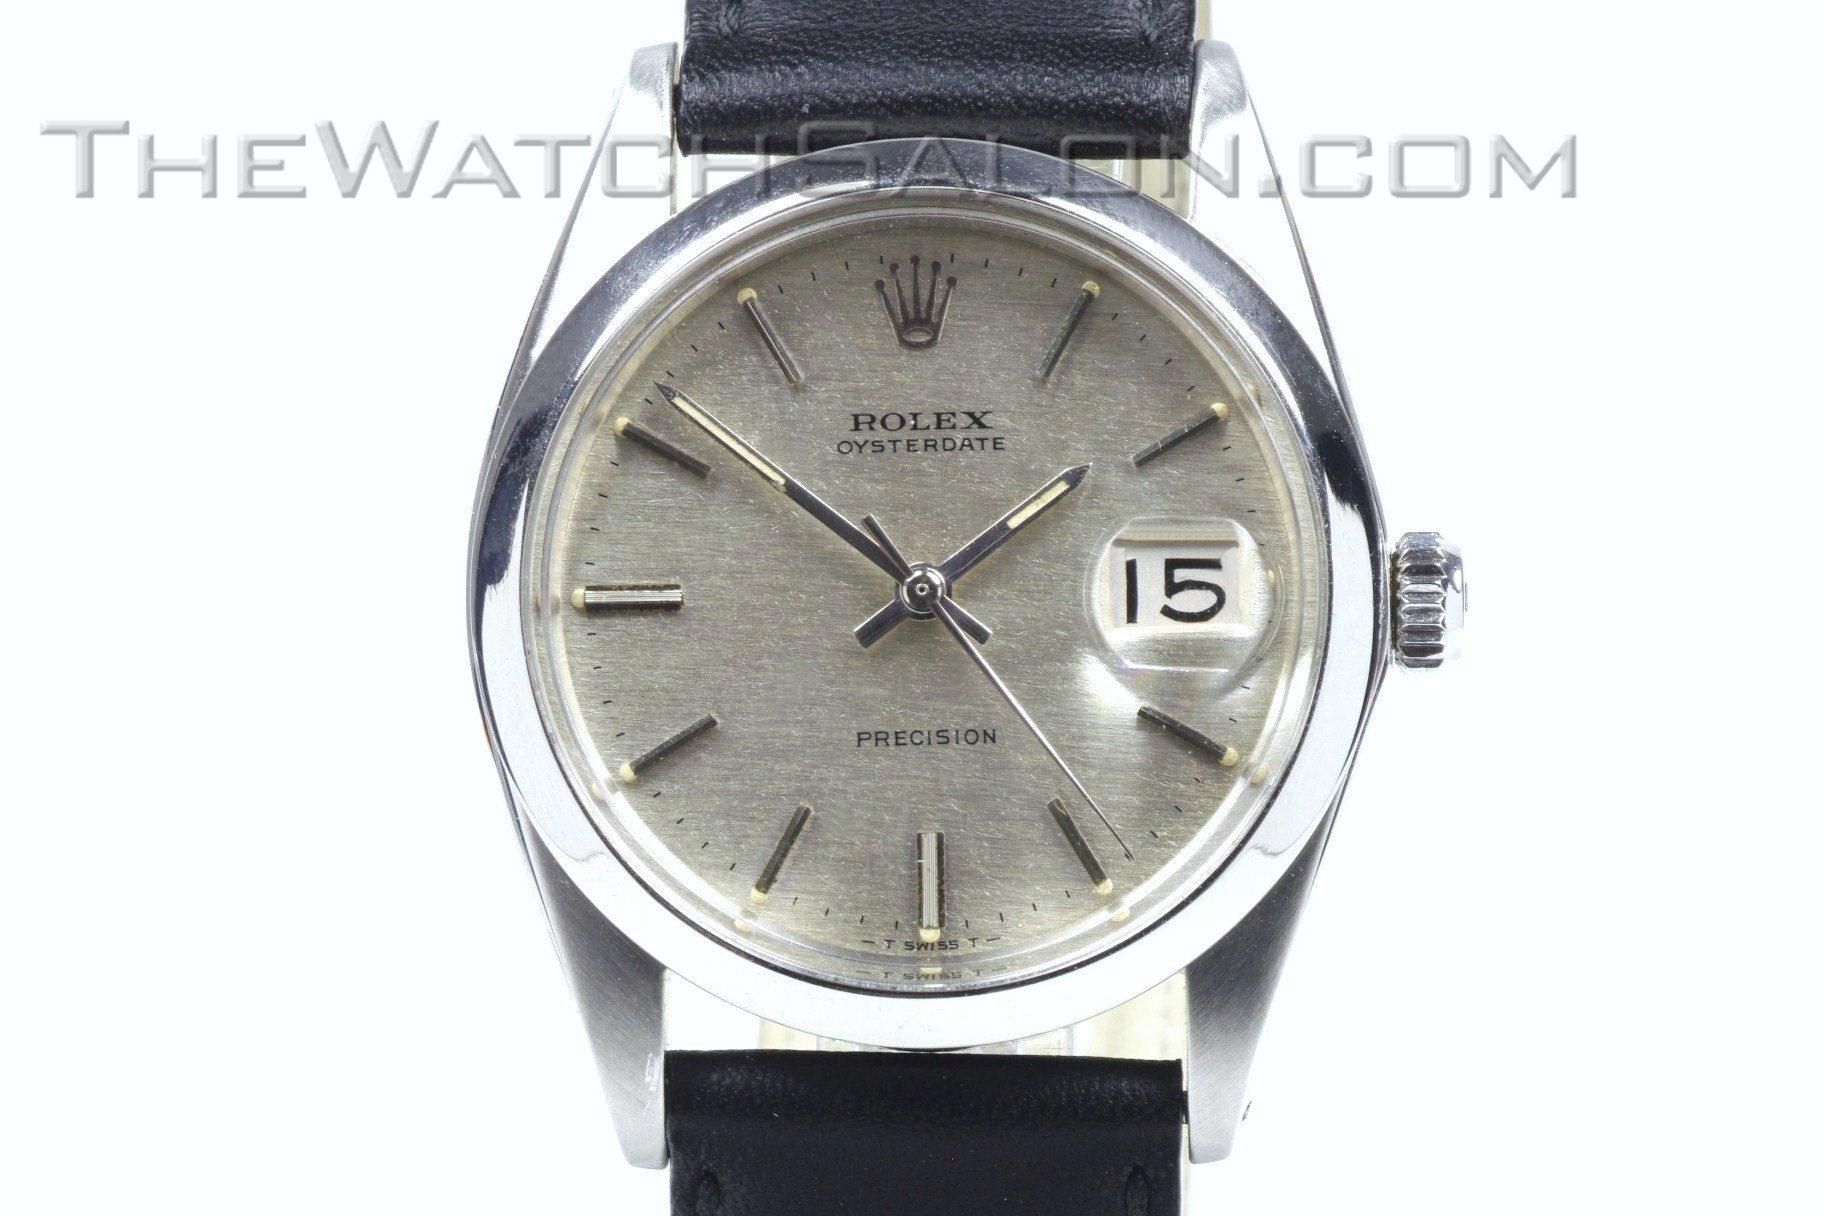 rolex oyster precision date 1968 the watch salonthe watch salon. Black Bedroom Furniture Sets. Home Design Ideas